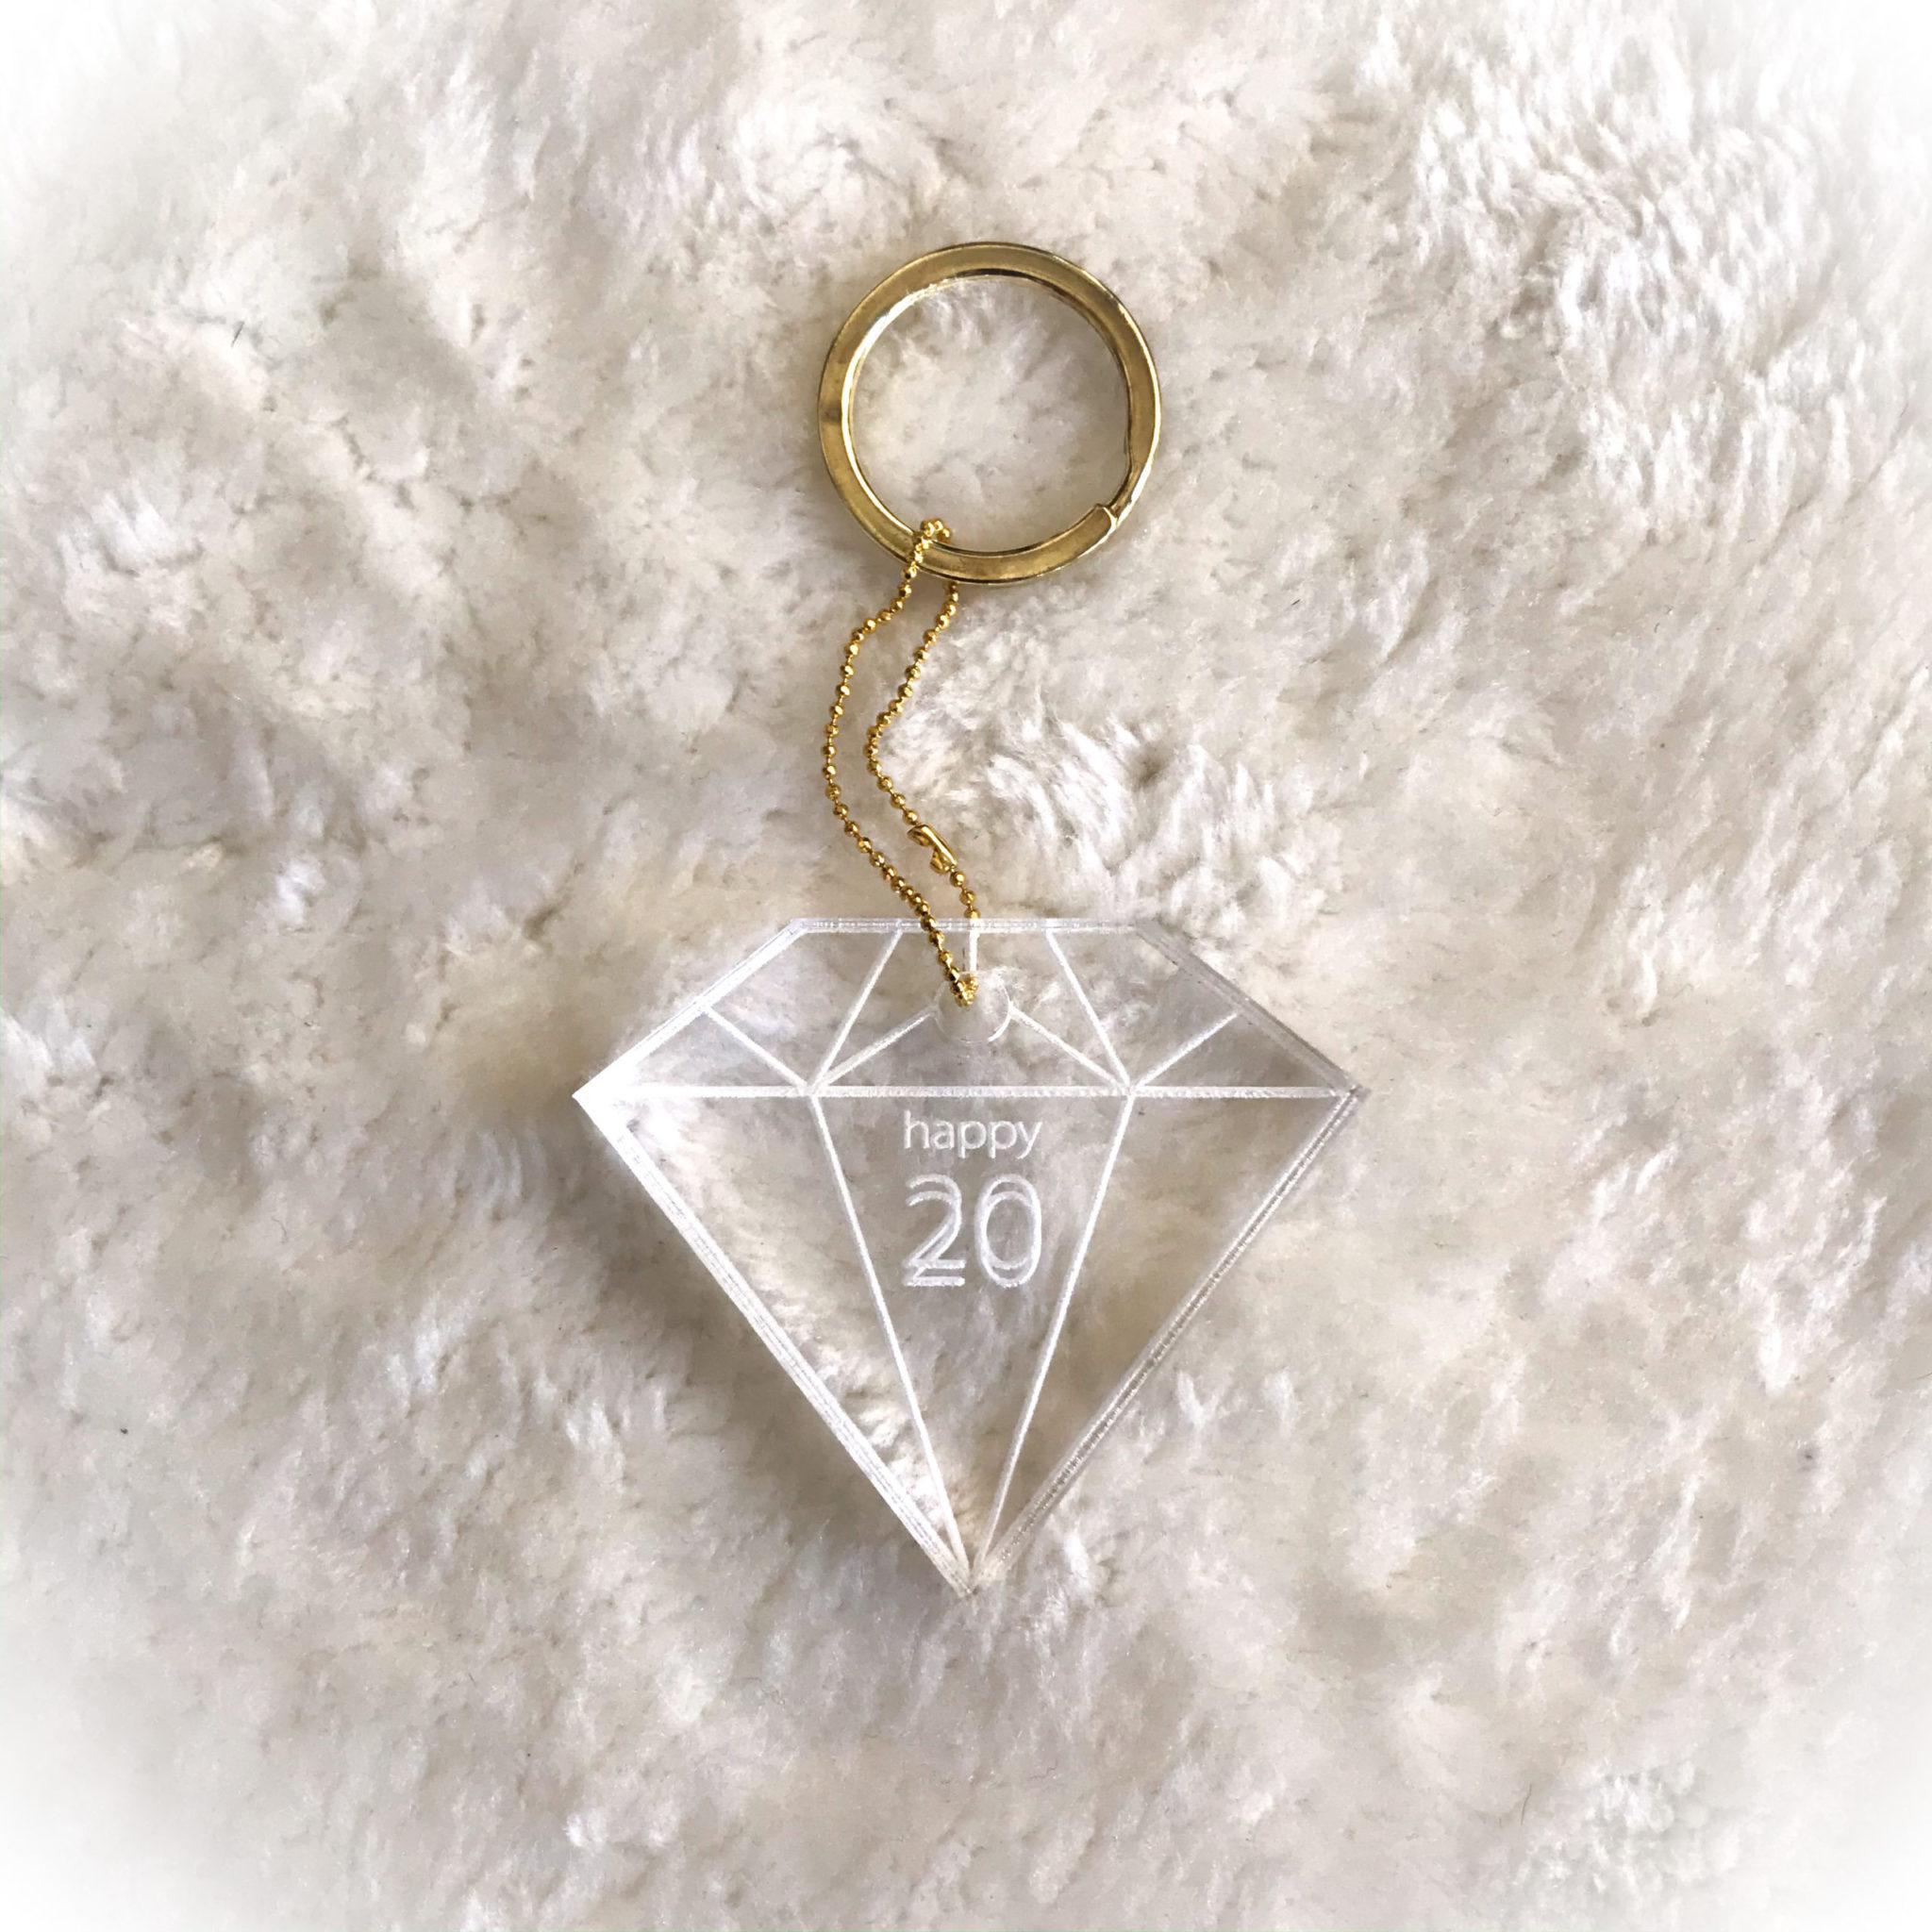 2020 Shine Bright Like A Diamond-special occasion-keychain